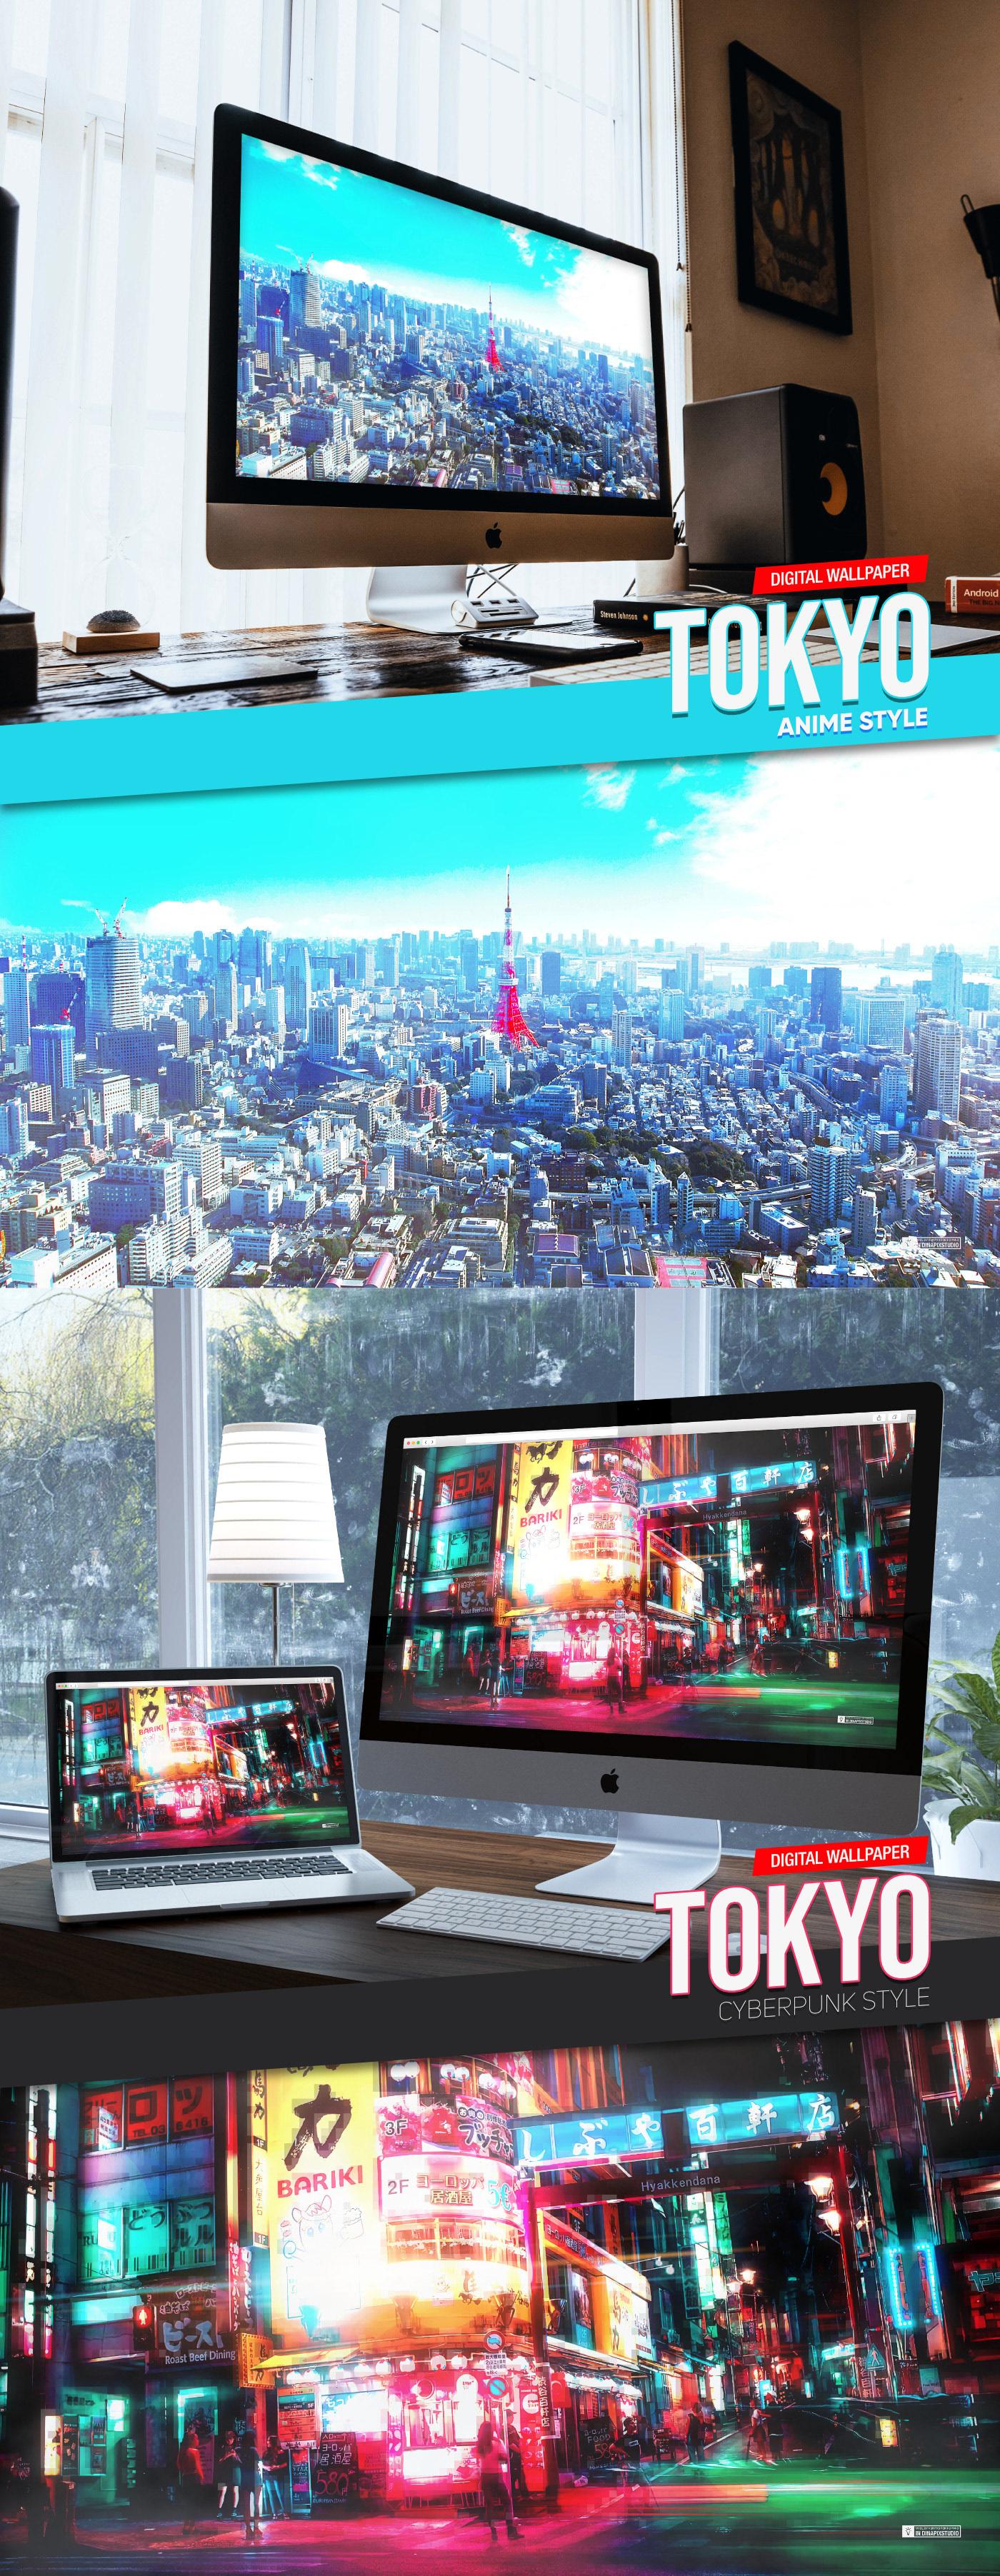 anime Cyberpunk Digital Art  japan JAPON photo edition tokyo wallpaper